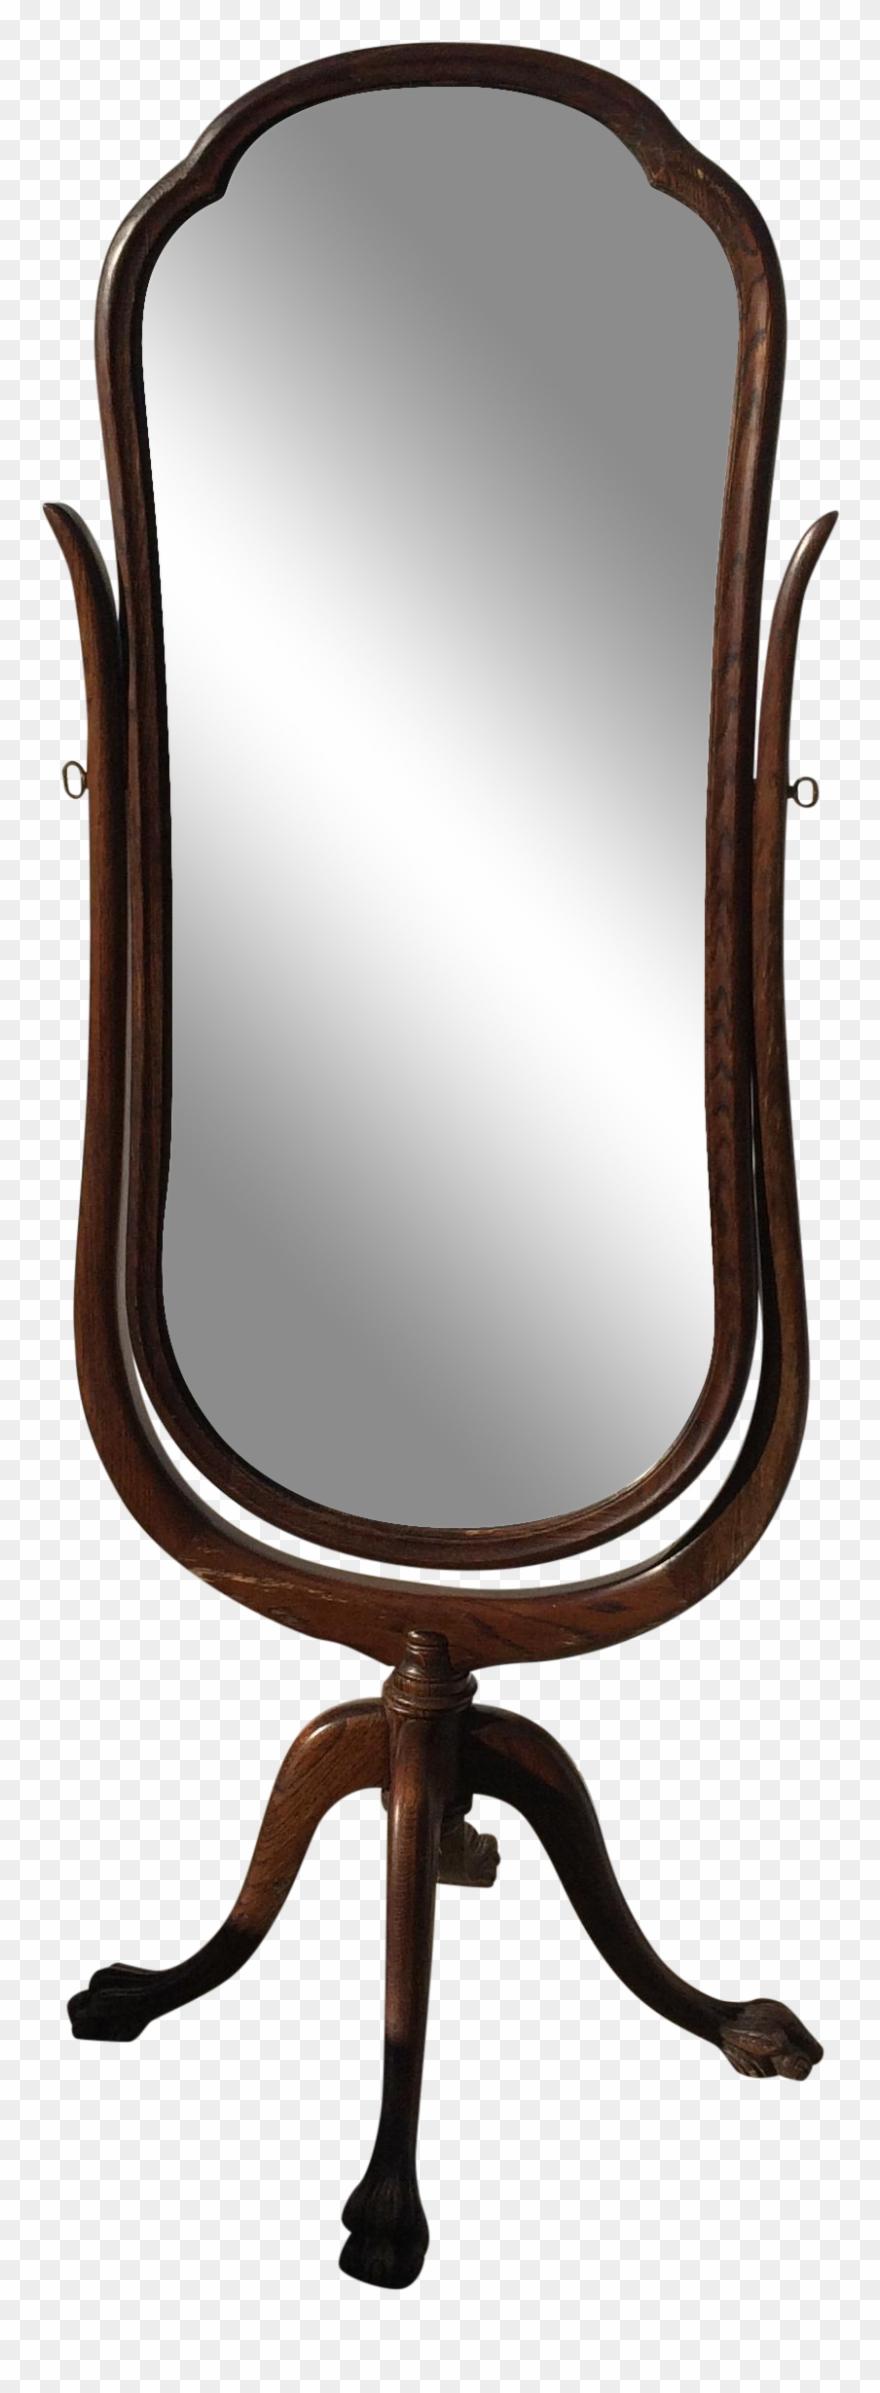 Mirror Clipart Floor Mirror Antique Cheval Mirror Png Download 551259 Pinclipart